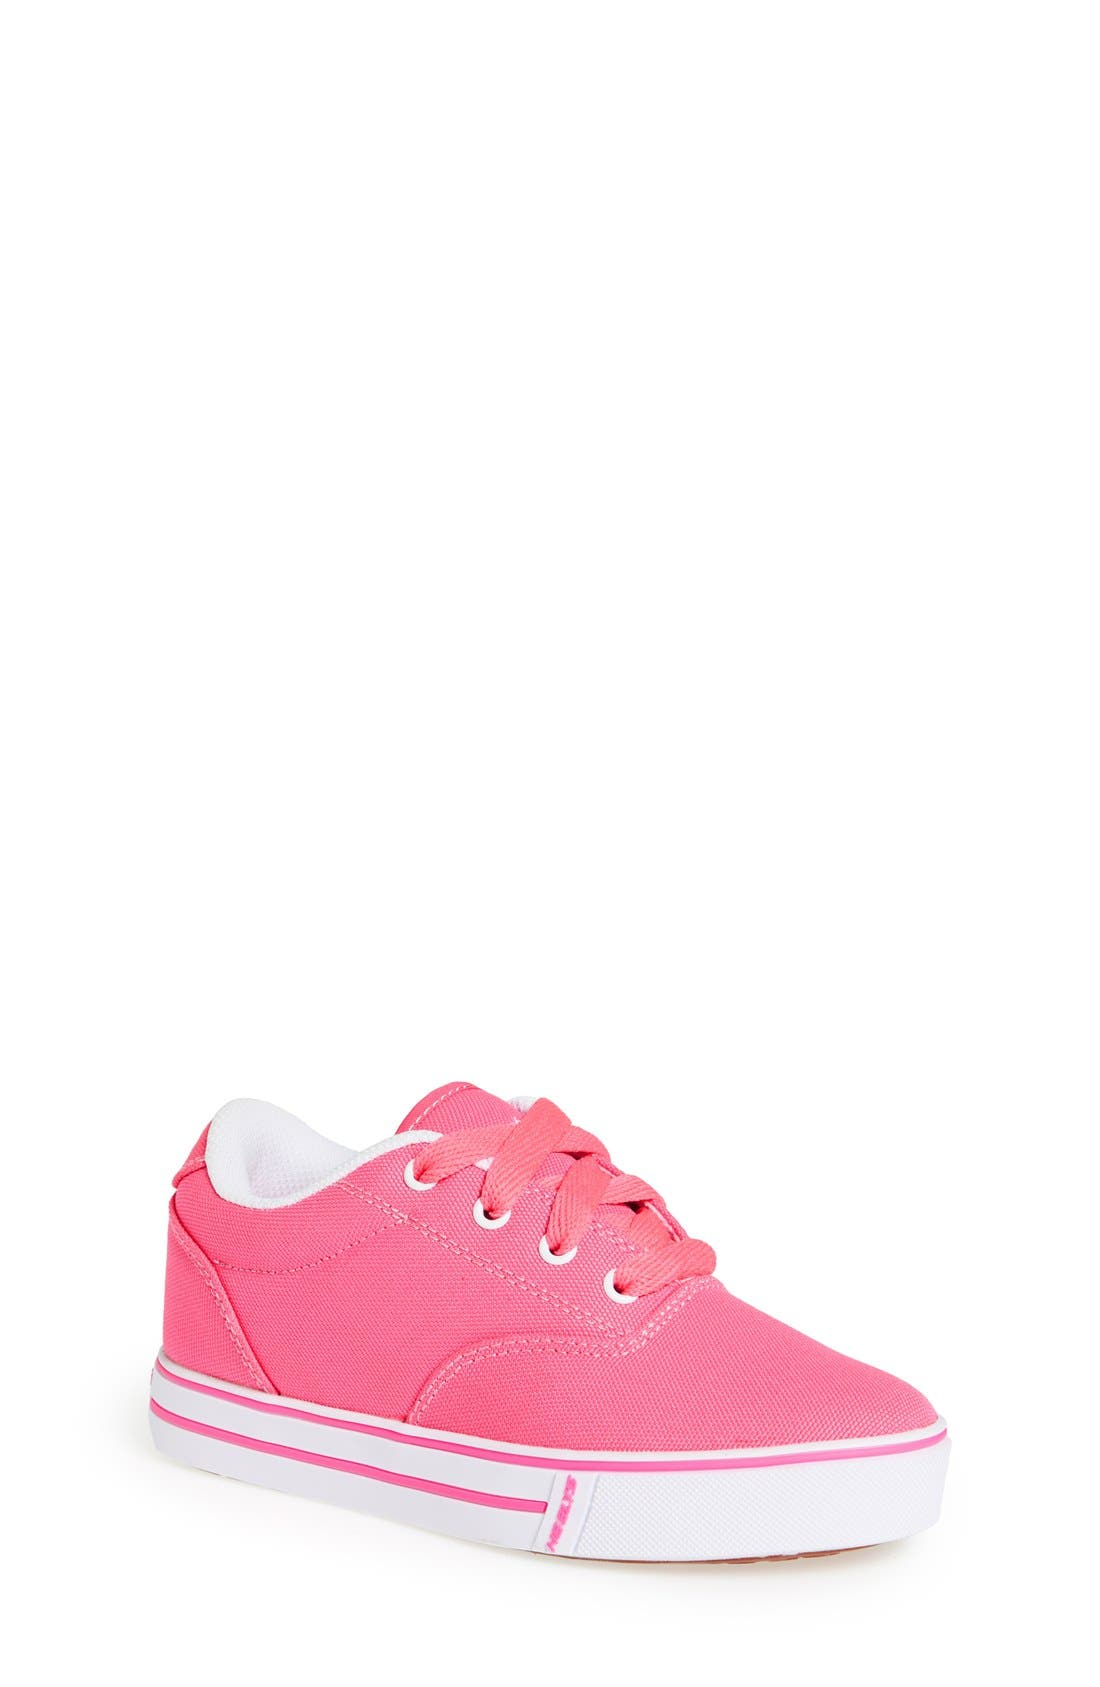 Alternate Image 1 Selected - Heelys 'Launch' Canvas Sneaker (Little Kid & Big Kid)